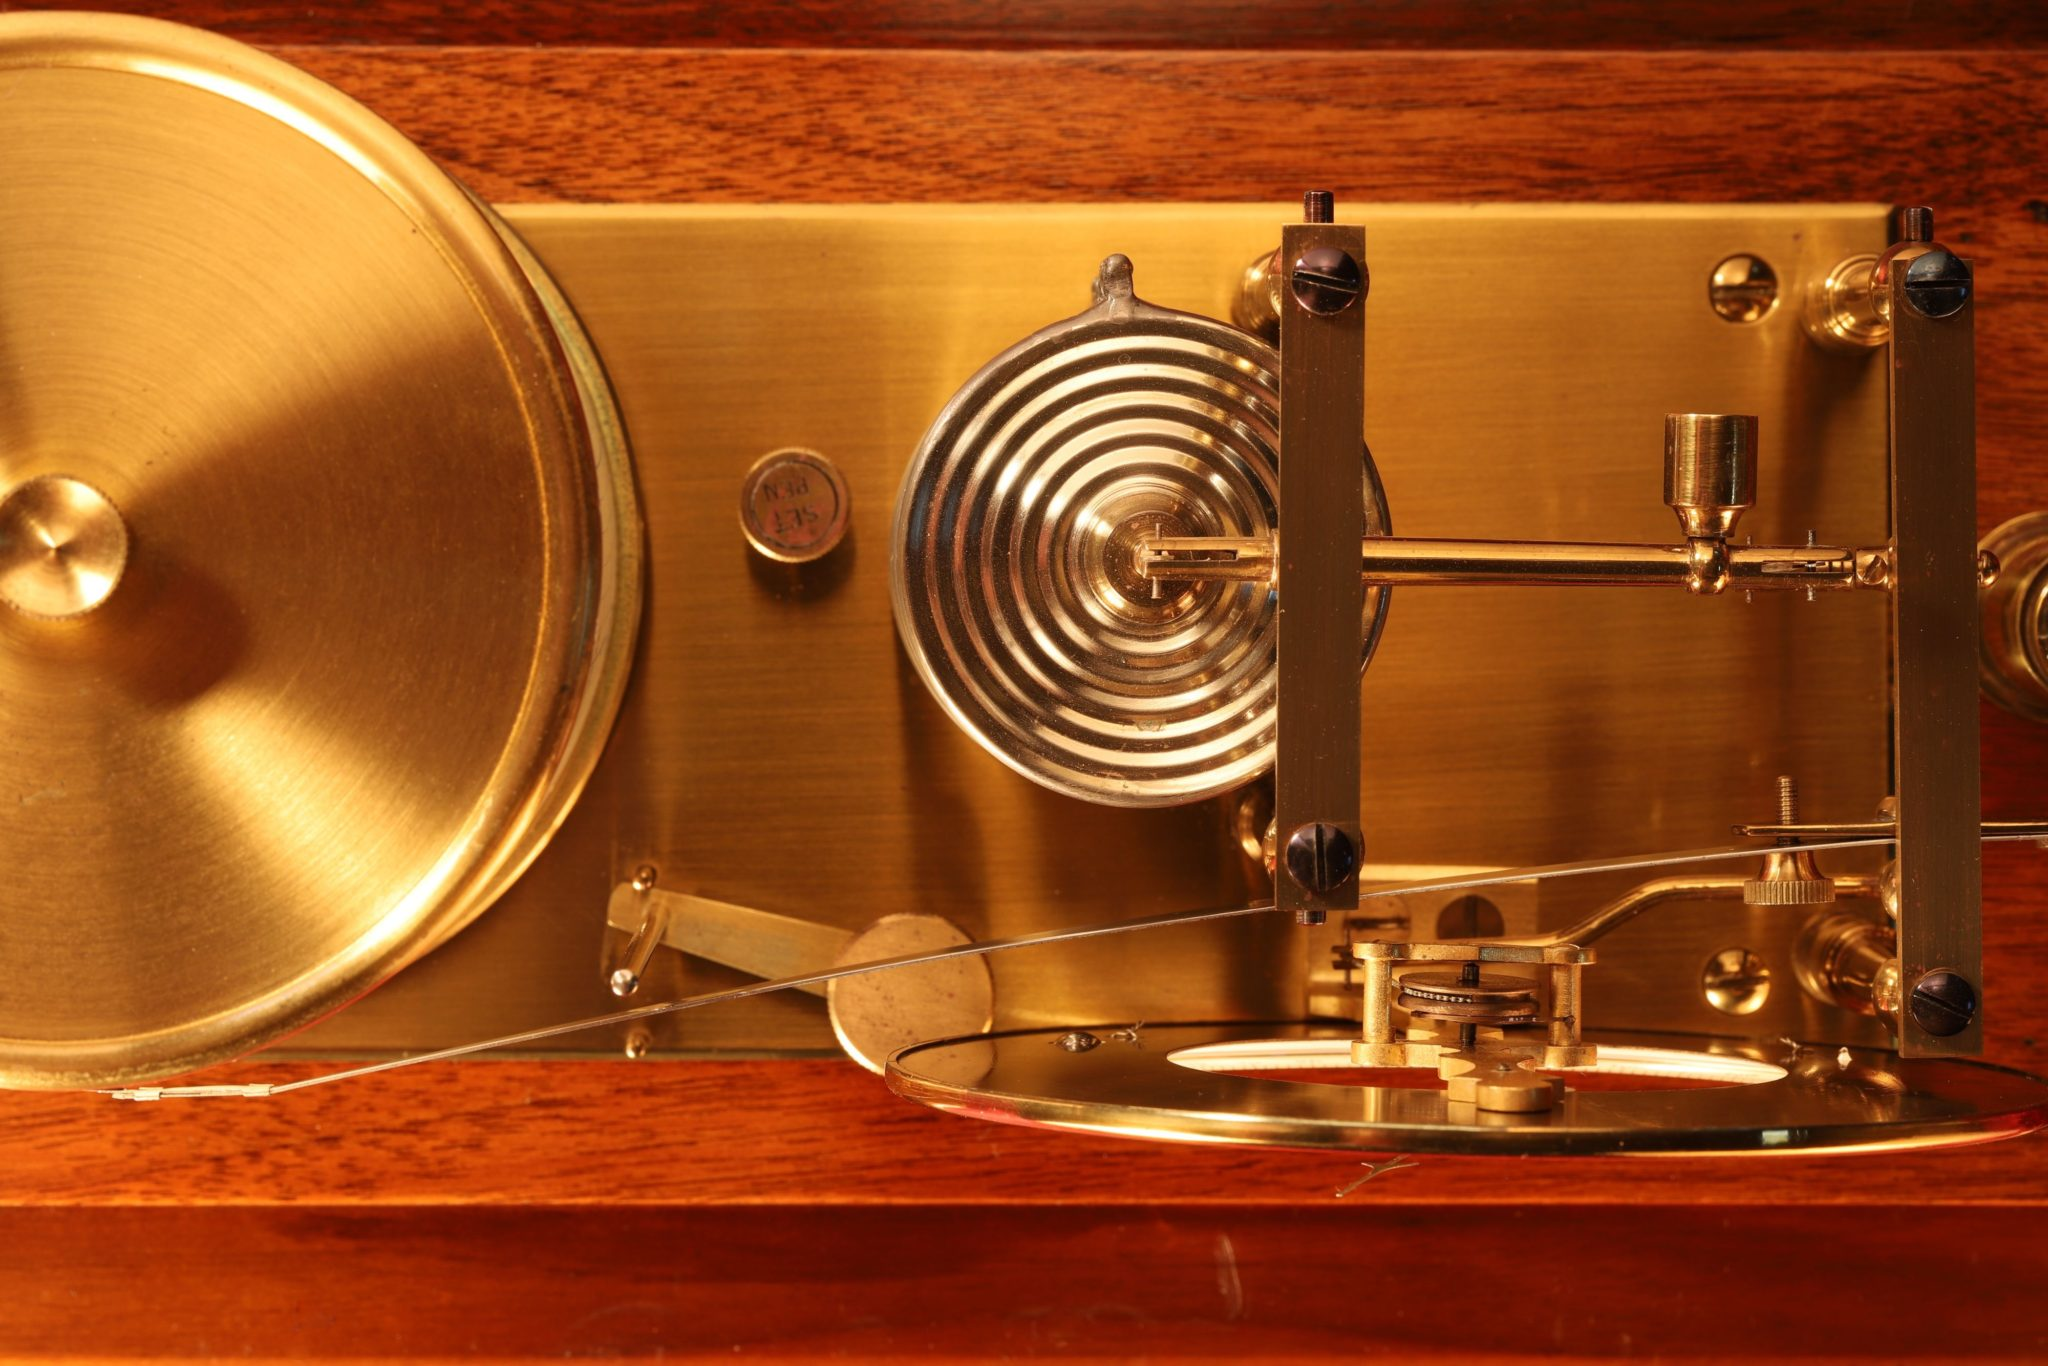 Image of Negretti & Zambra Barograph with Dial c1915